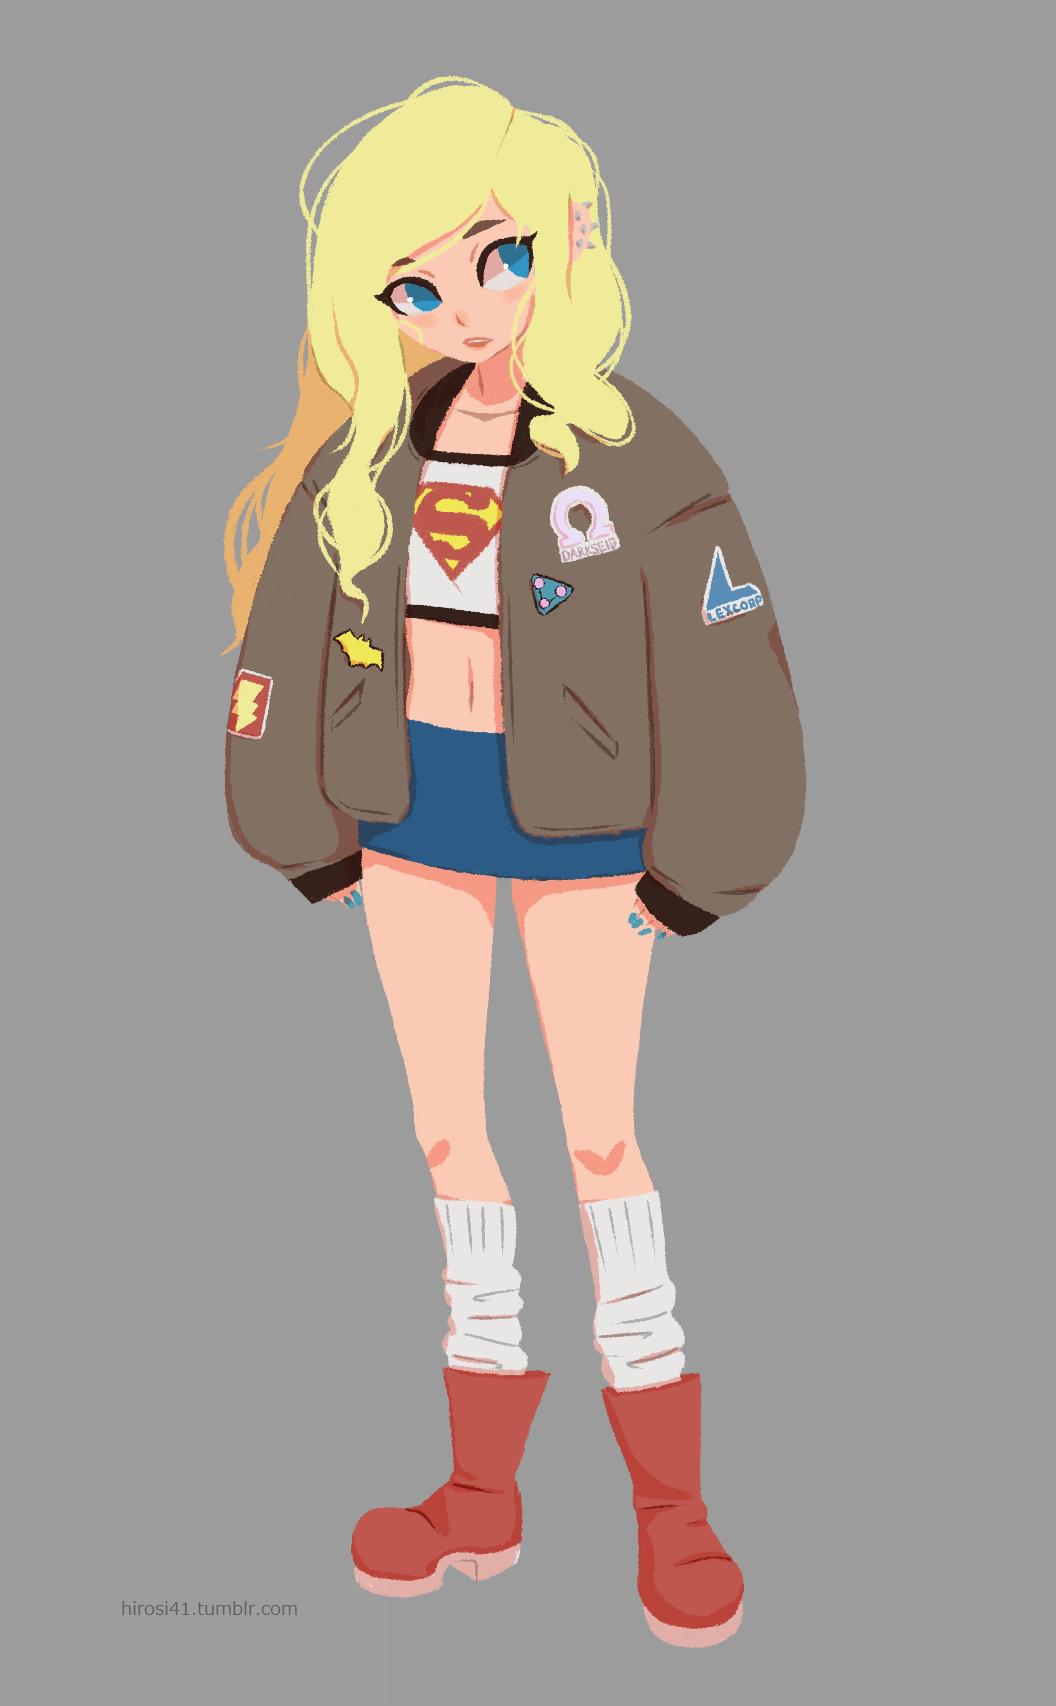 Supergirl by hirosi41